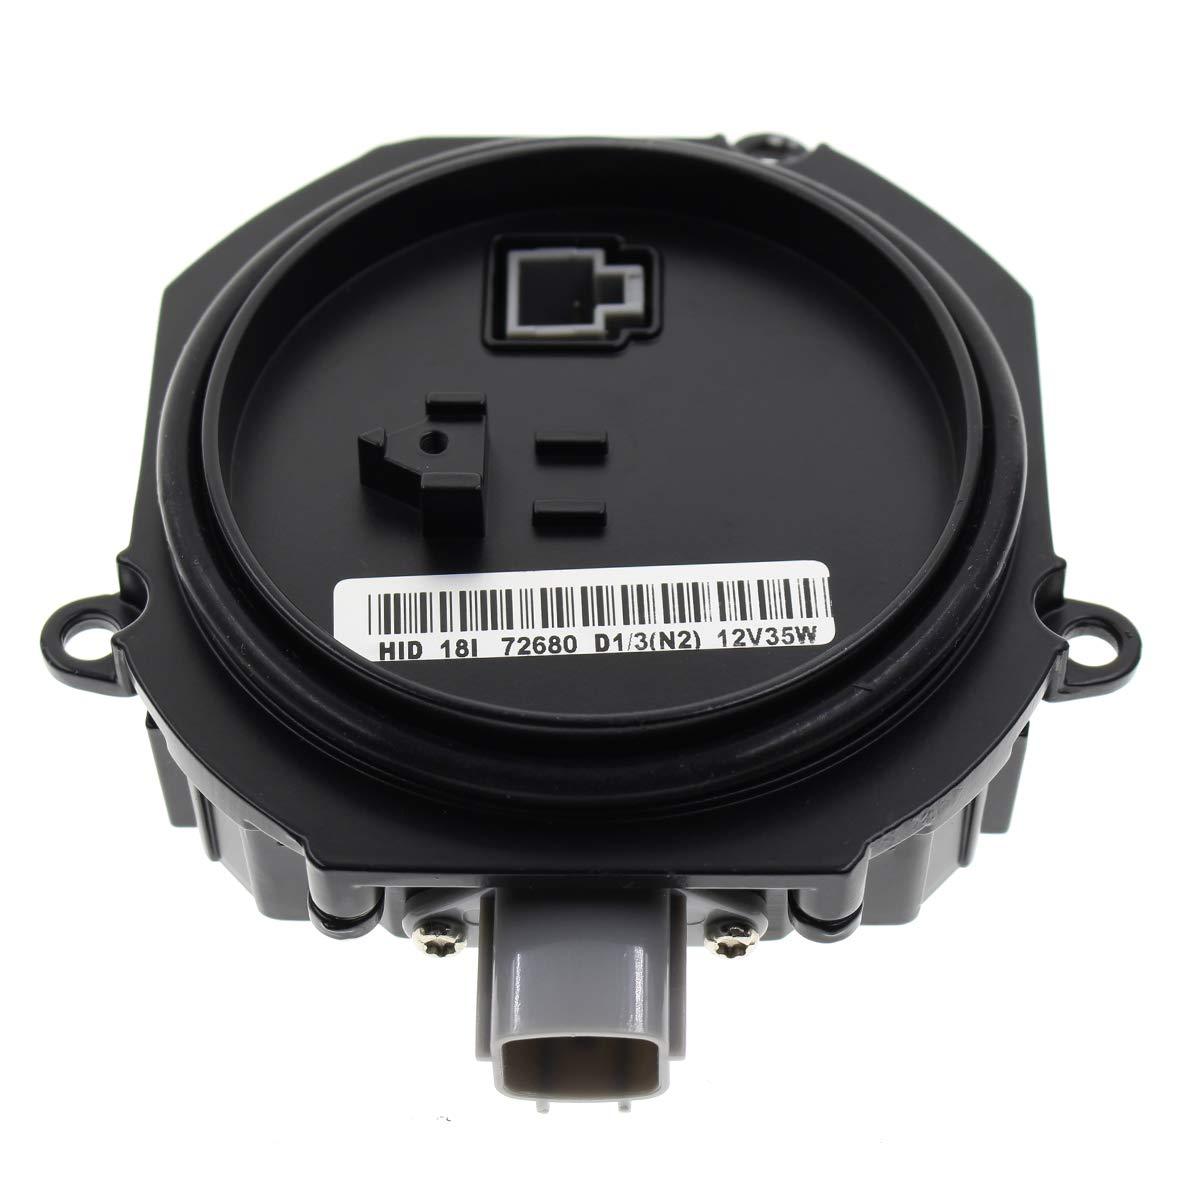 MOTOALL HID Xenon Headlight Ballast Control Unit Module for D2R D2S Bulb Nissan Infiniti Mazda Saab 28474-89904 28474-89907 28474-8991A 28474-89915 Matsushita NZMNS111LANA NZMNS111LBNA NZMNS111LANH